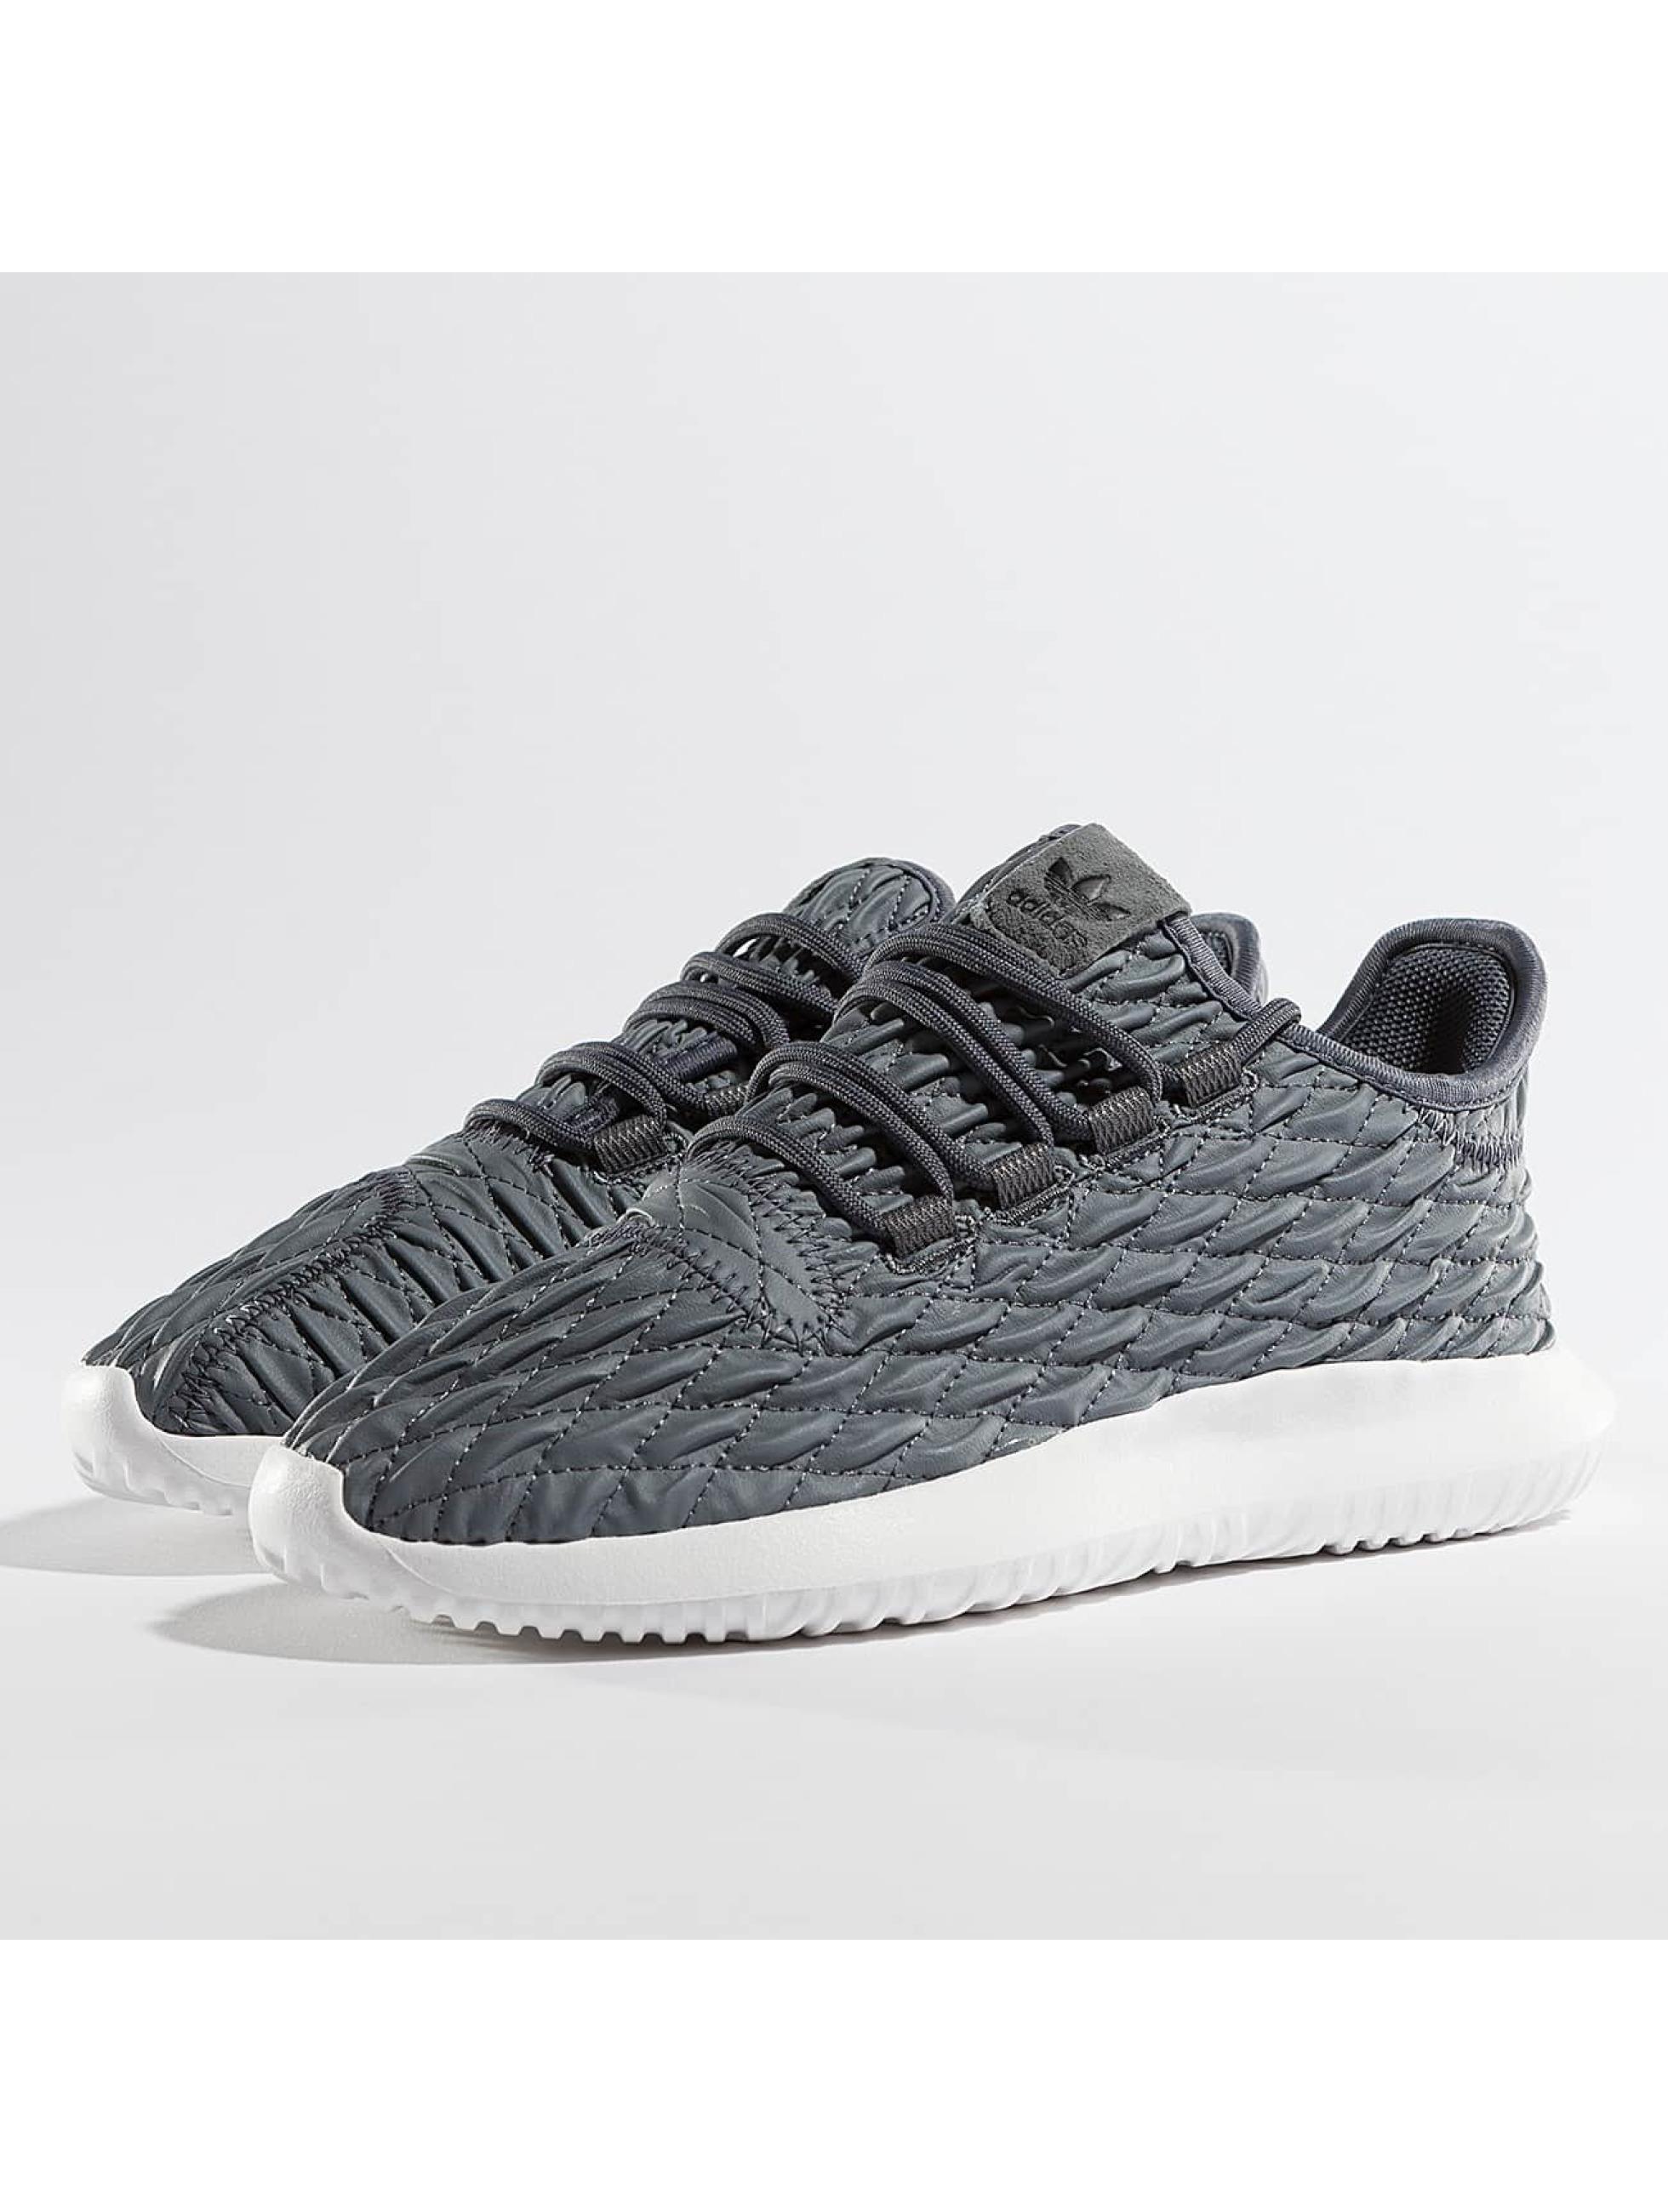 adidas damen schuhe sneaker tubular shadow ebay. Black Bedroom Furniture Sets. Home Design Ideas